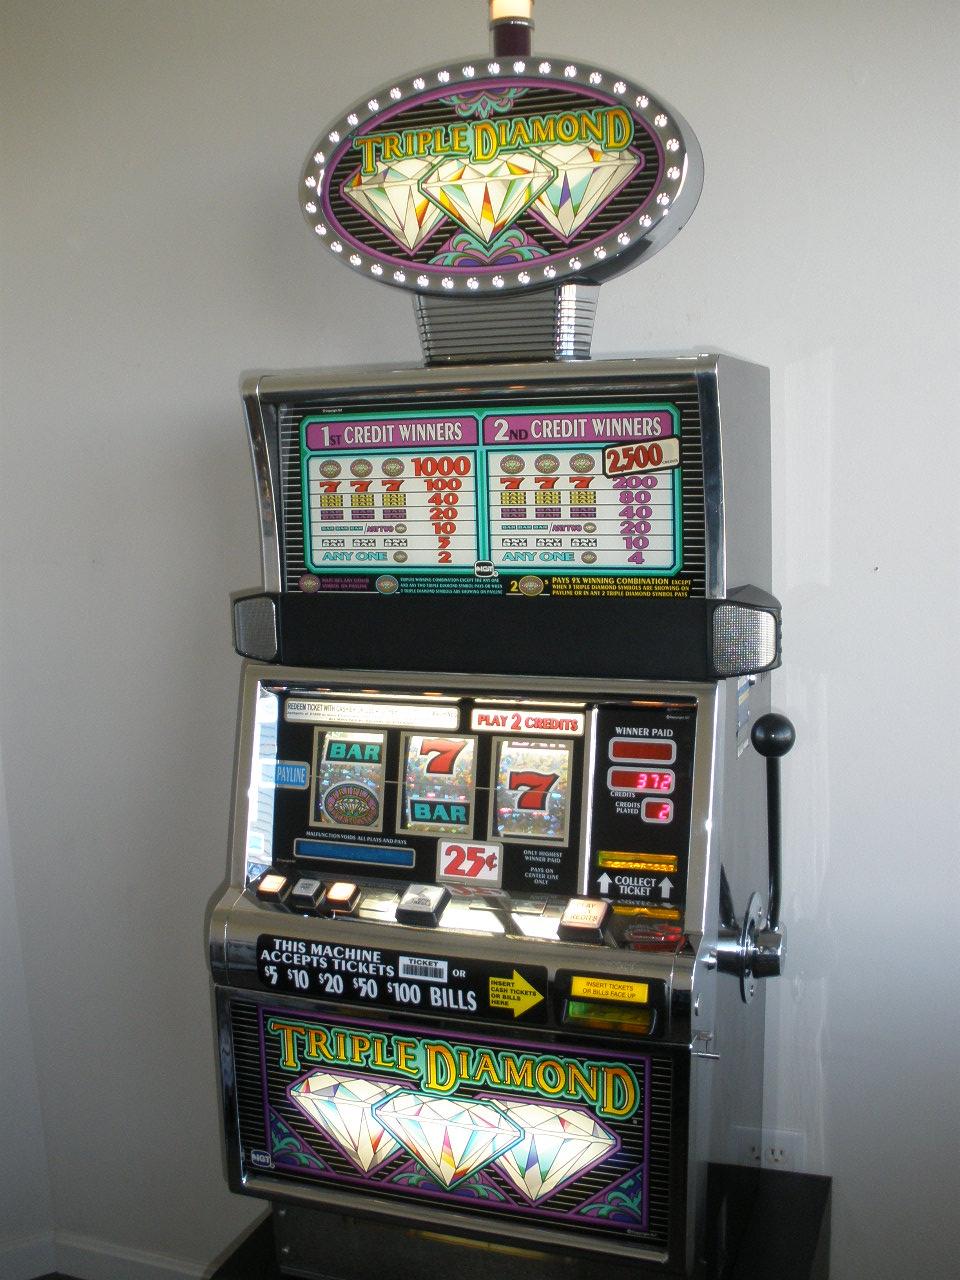 Metodi prelievo slot machine lanzado